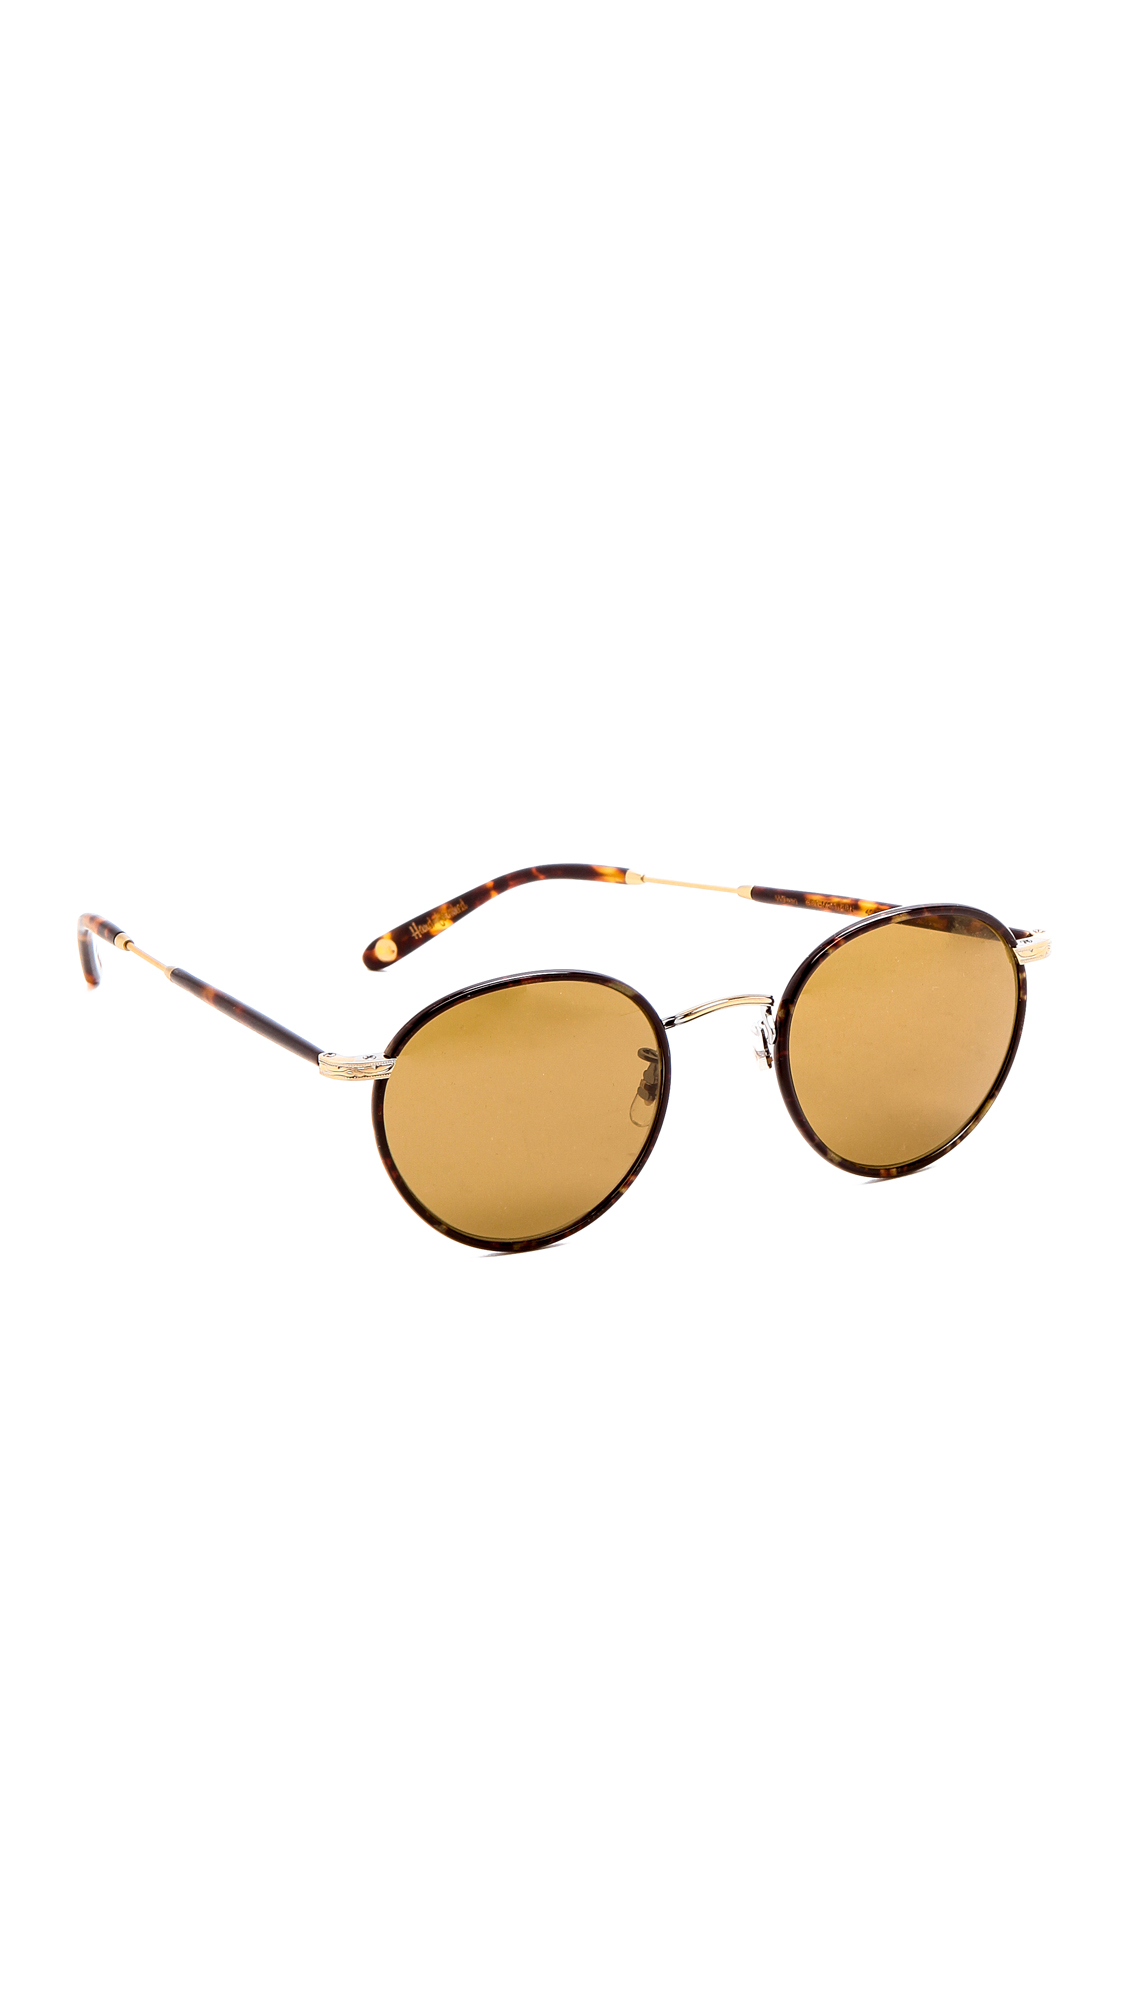 GARRETT LEIGHT Wilson Sunglasses - Bourbon Tortoise/Pure Brown